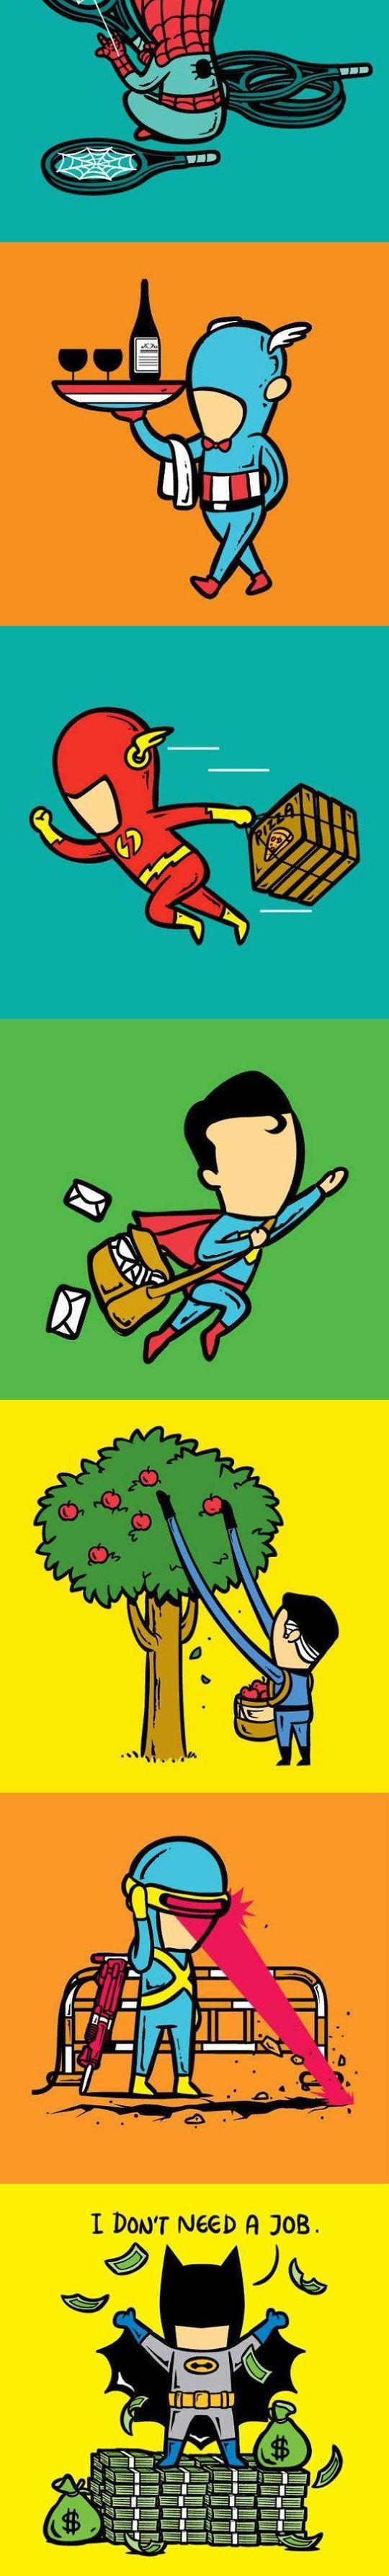 Funny Superhero Part Time Job